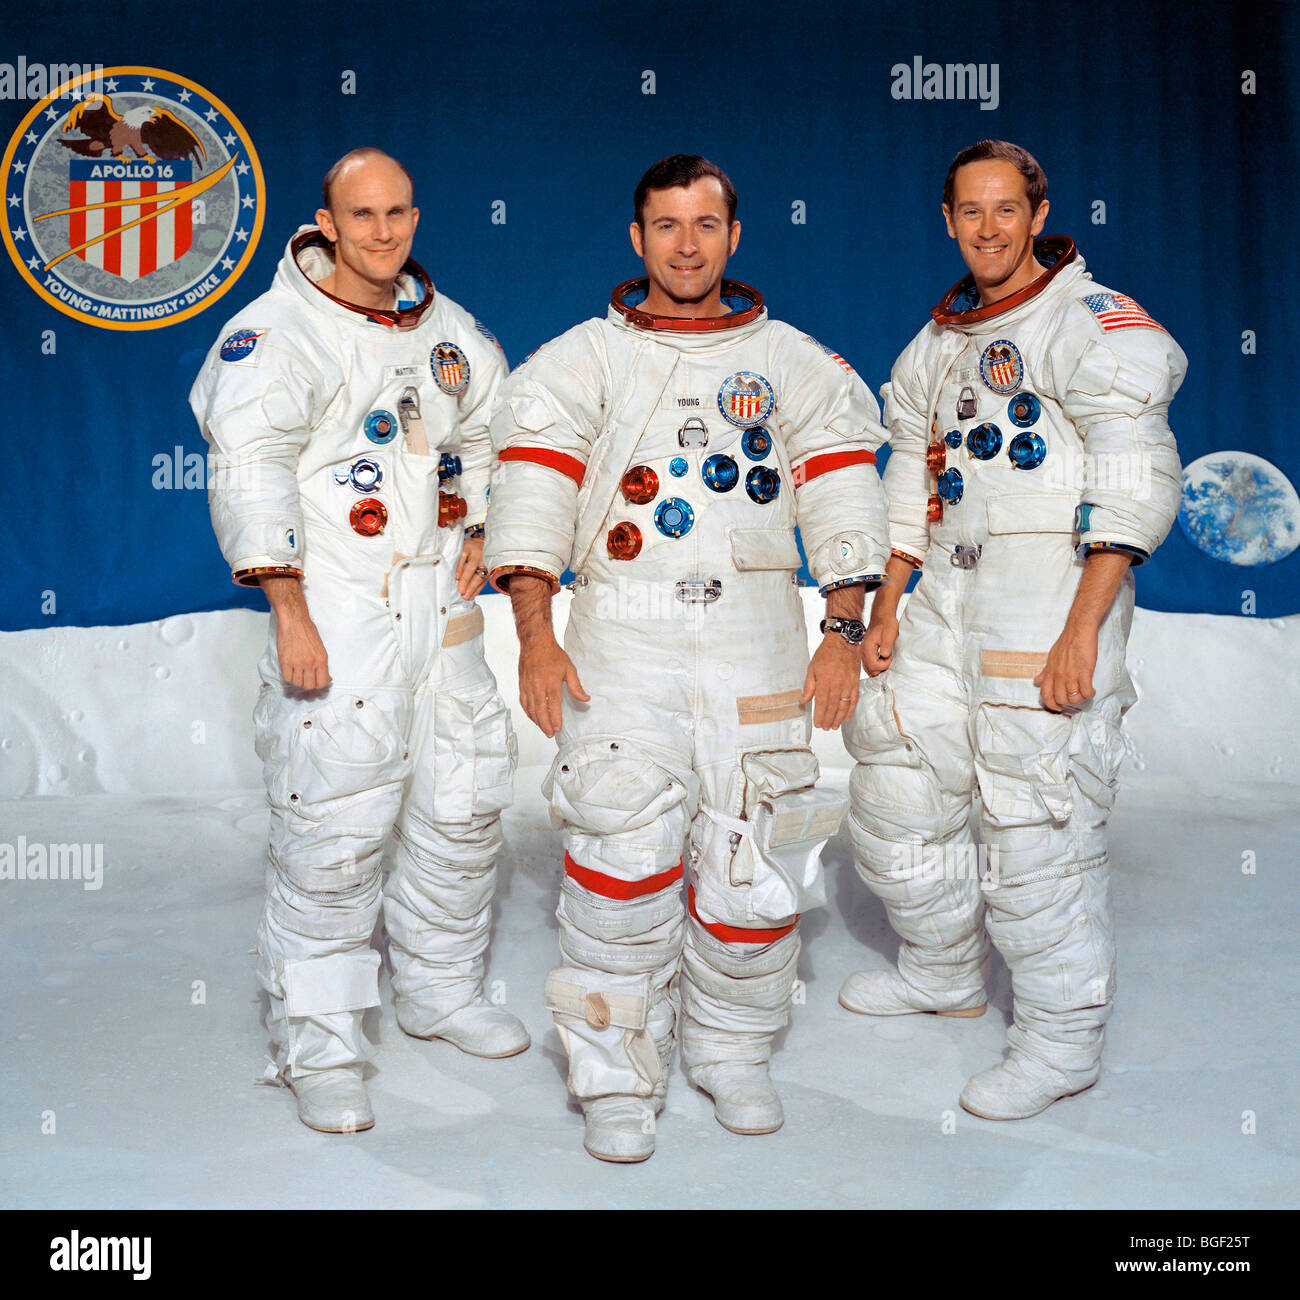 Apollo 16 prime crew, left to right, Thomas K. Mattingly II, John W. Young and Charles M. Duke Jr. Stock Photo